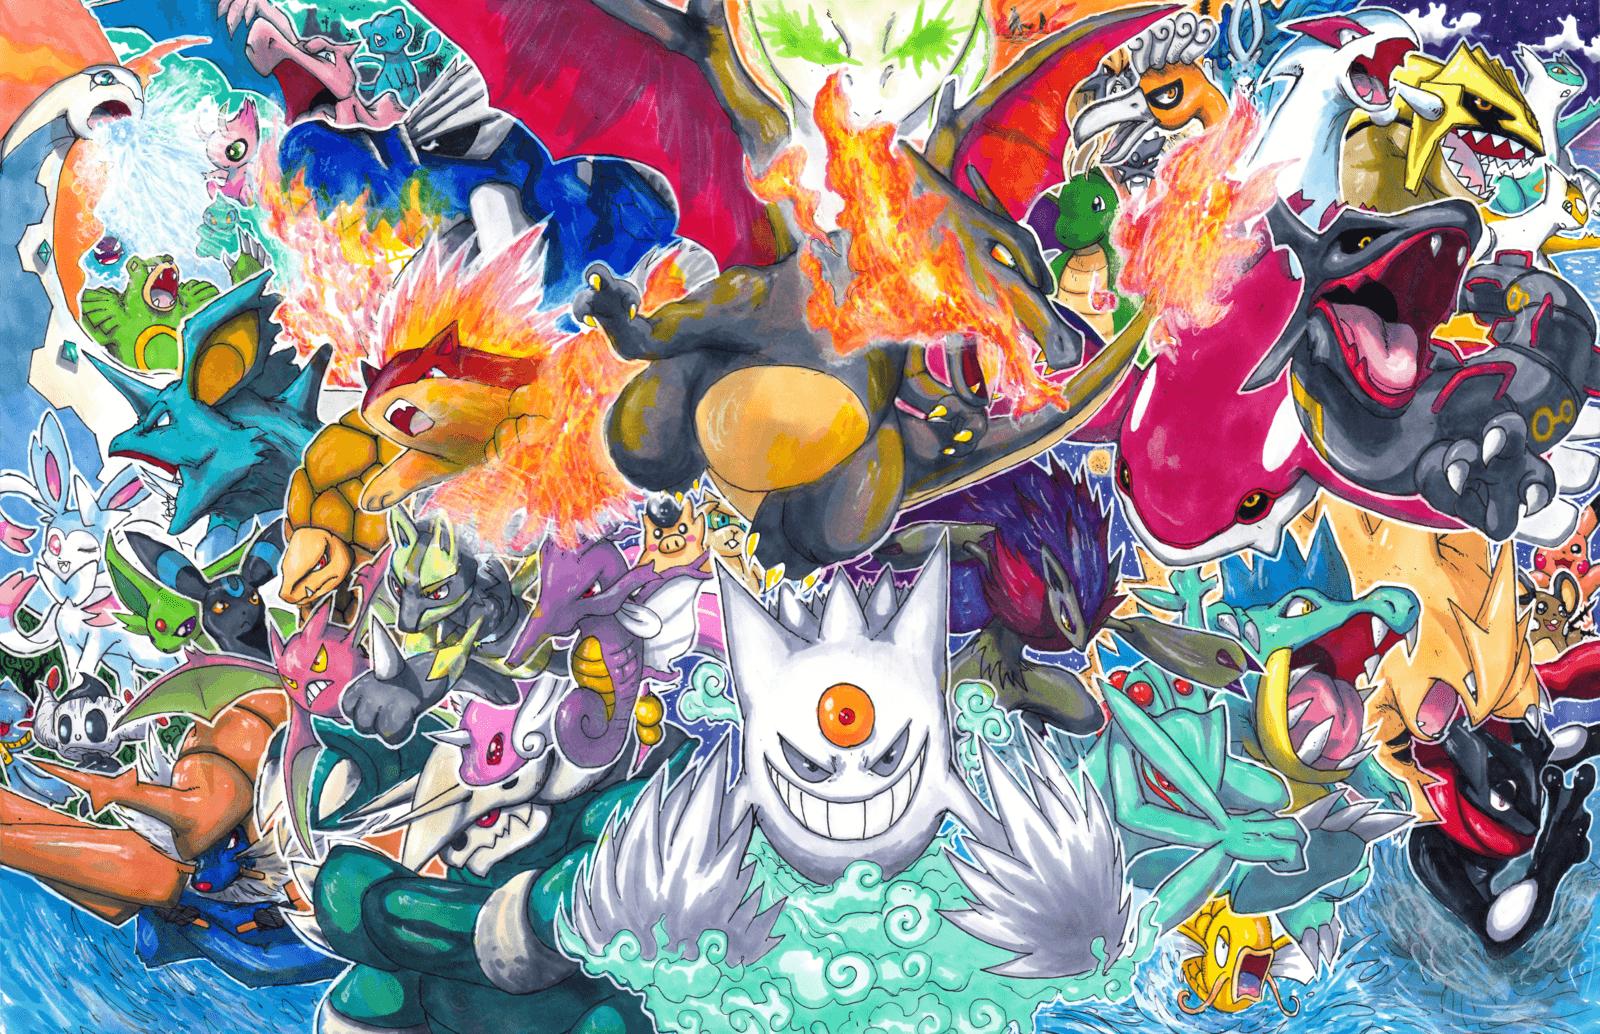 All Shiny Legendary Pokemon Wallpapers Top Free All Shiny Legendary Pokemon Backgrounds Wallpaperaccess